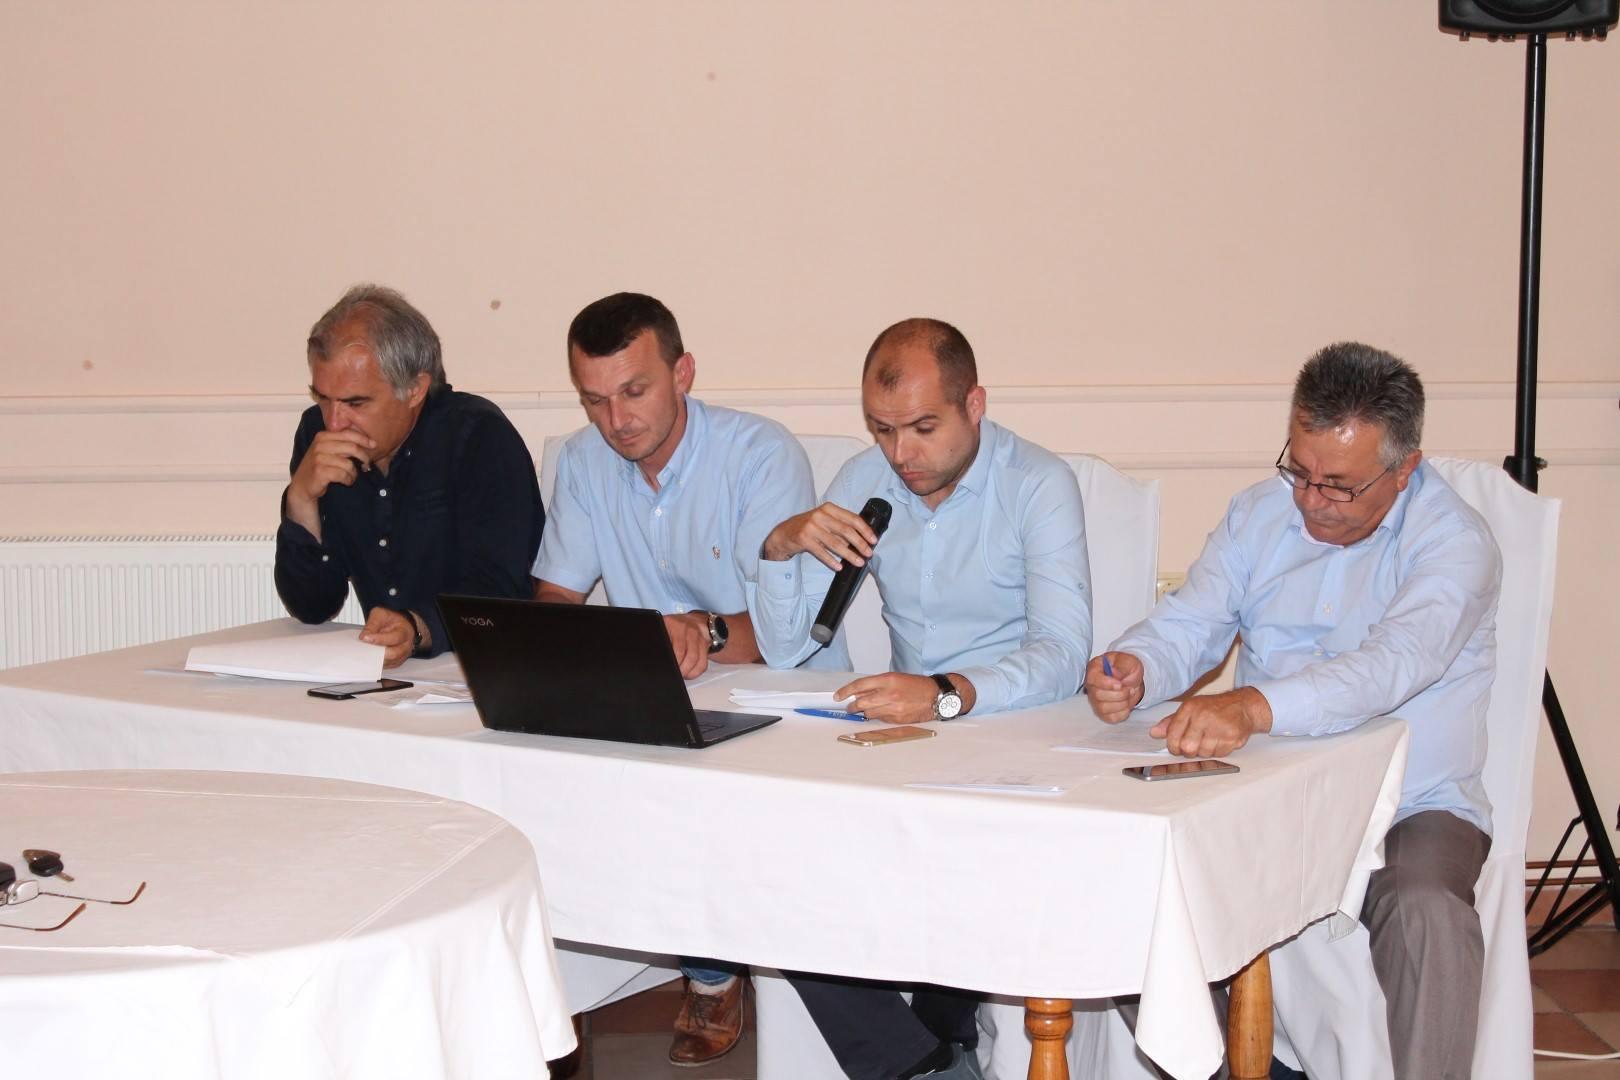 Posušje: Članovi Udruge gospodarstvenika povećali broj zaposlenih za 125 zaposlenika